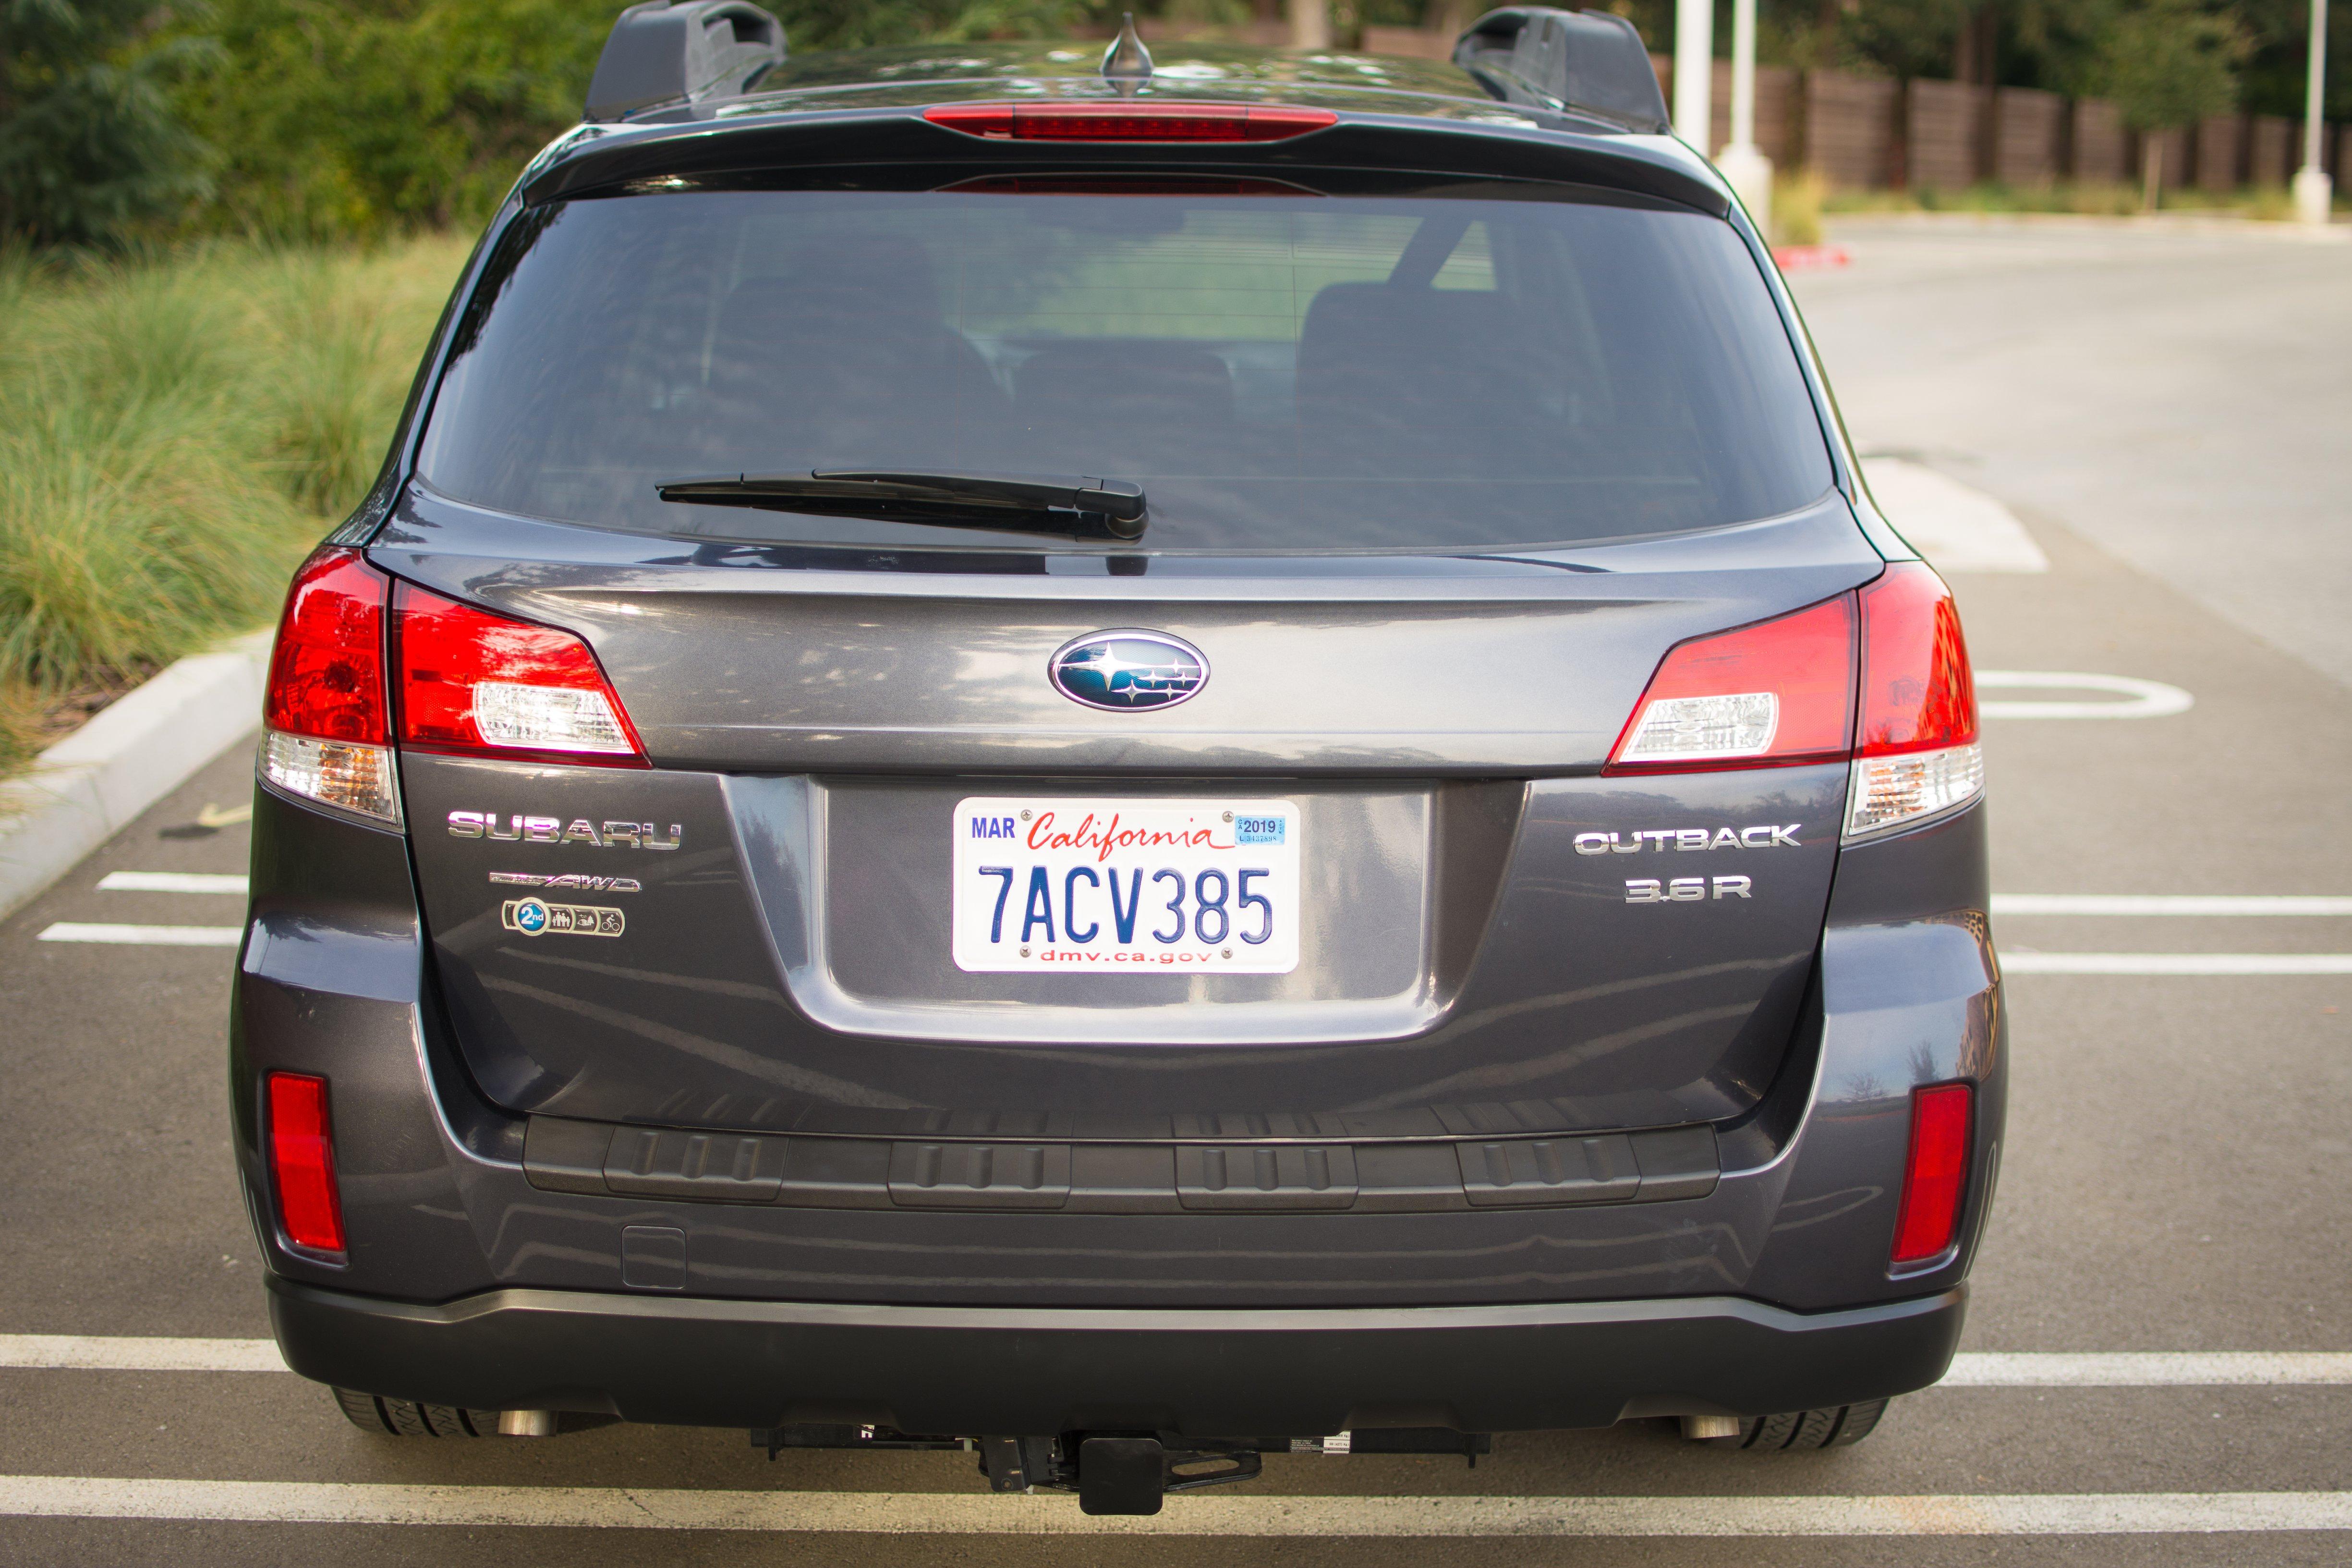 FS 2013 Subaru Outback 3 6R Limited 37 200 miles $24 900 OBO